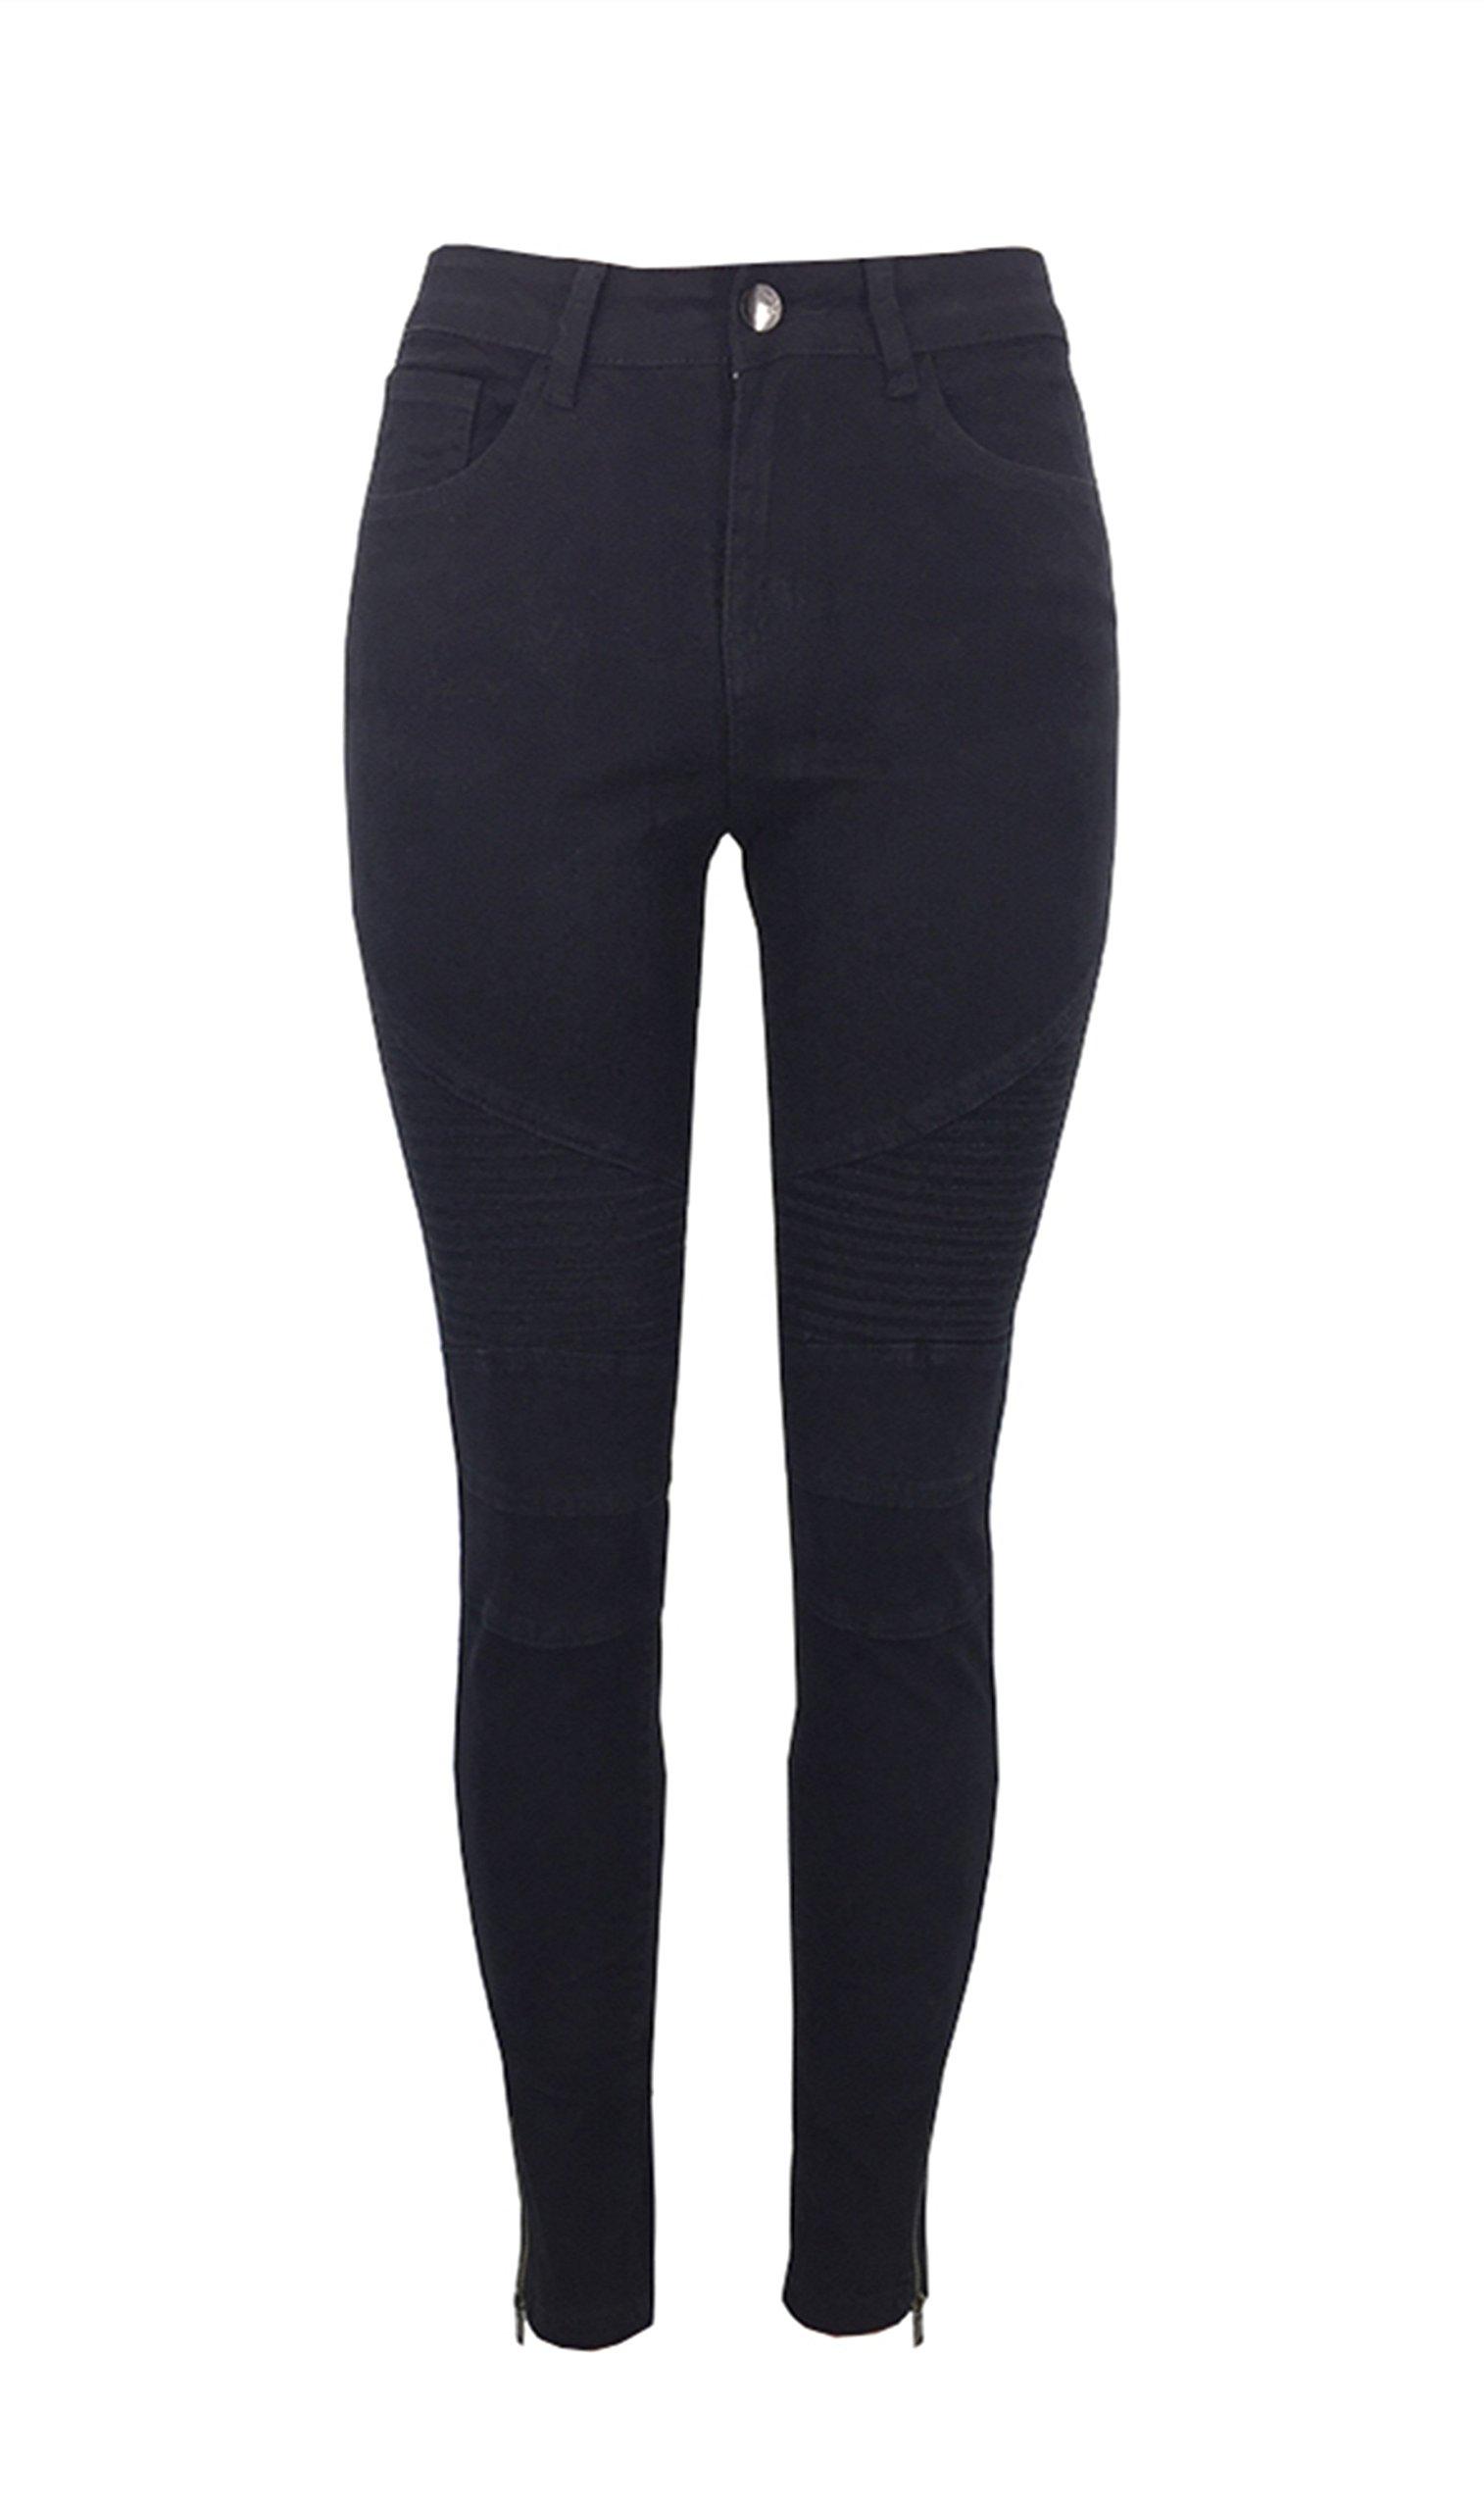 Women Casual Butt Lift Stretch Jegging Skinny Biker Jeans Denim Moto Pants Green